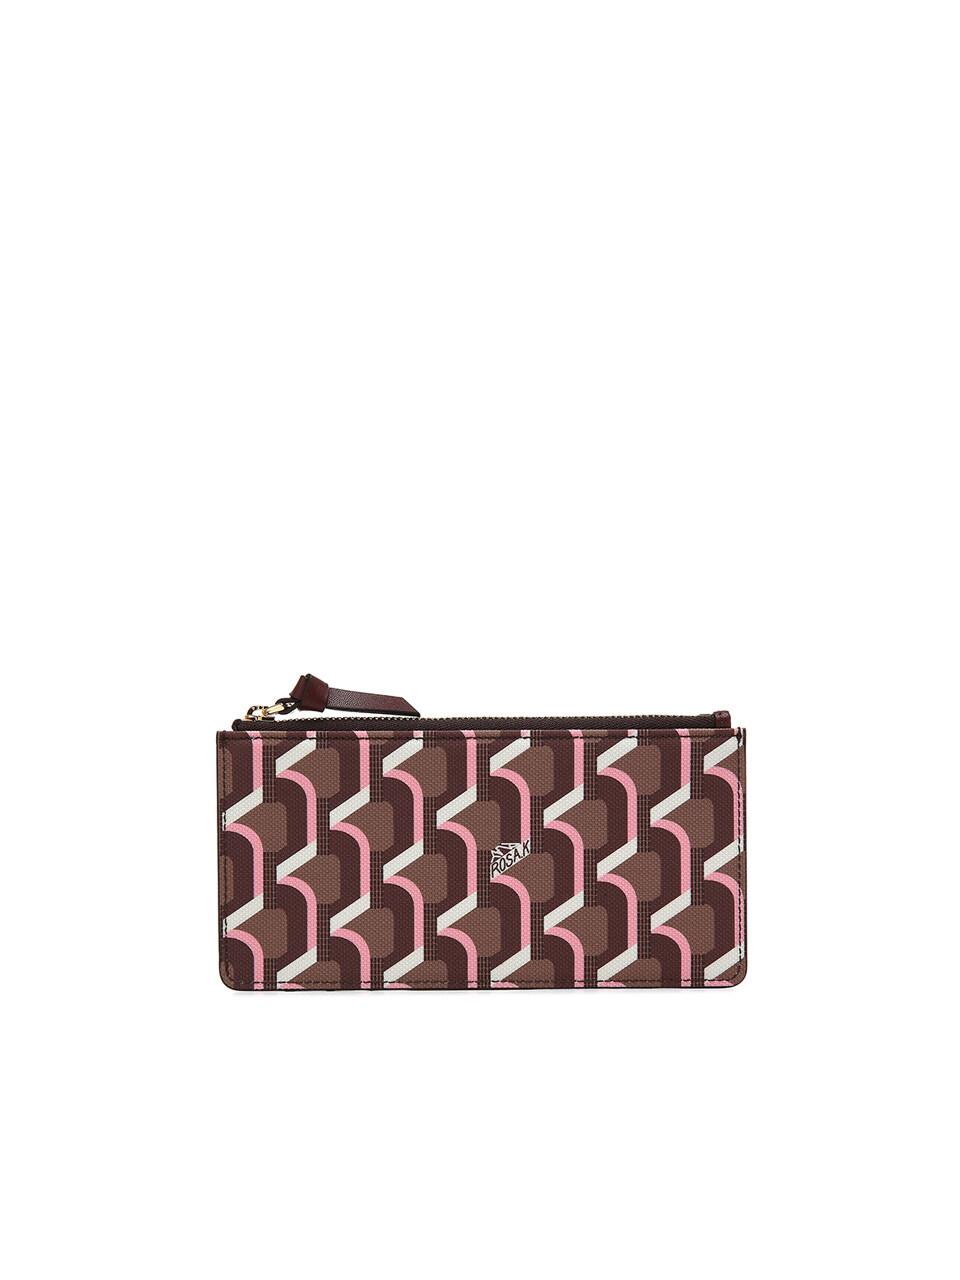 Monogram Slim Card Wallet - Rose Cognac